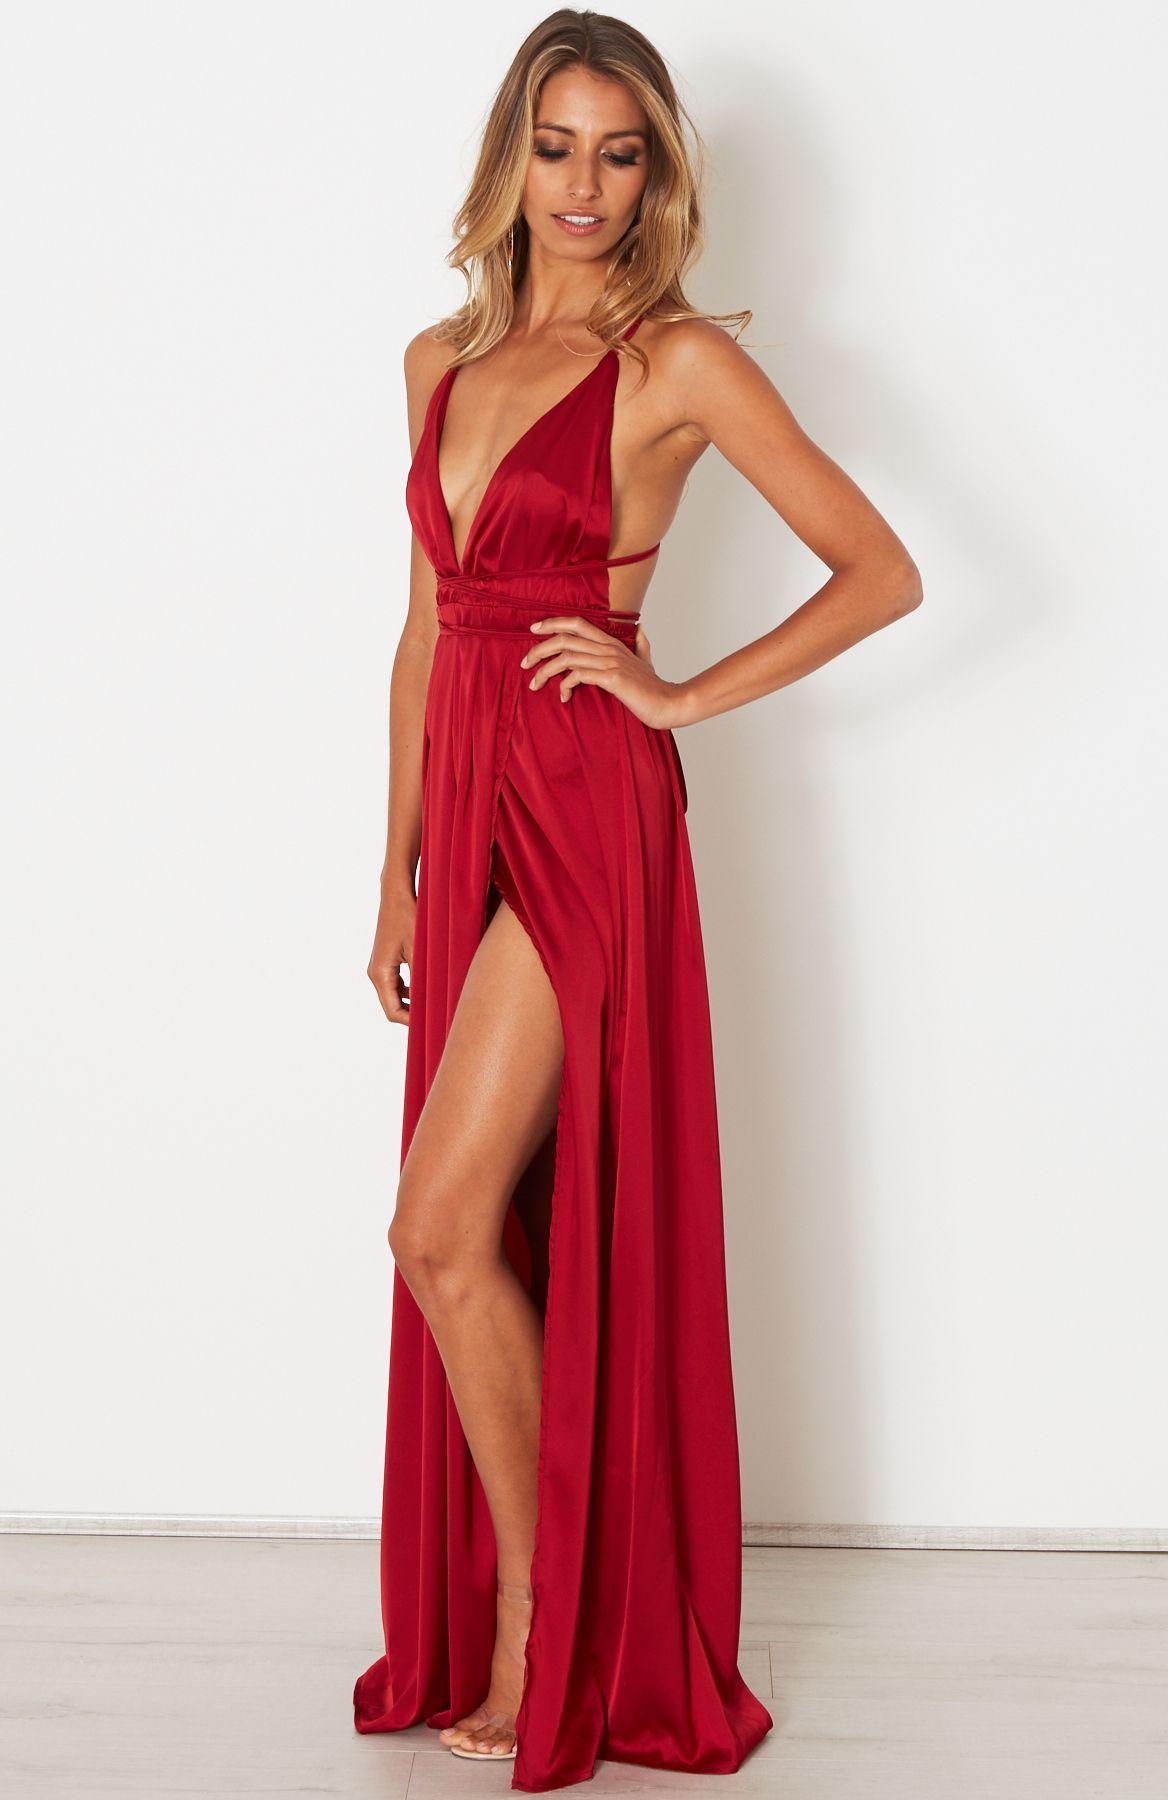 0d0fedf5eac Akela Maxi Dress Wine - Maxi Dresses - Dresses - CLOTHING